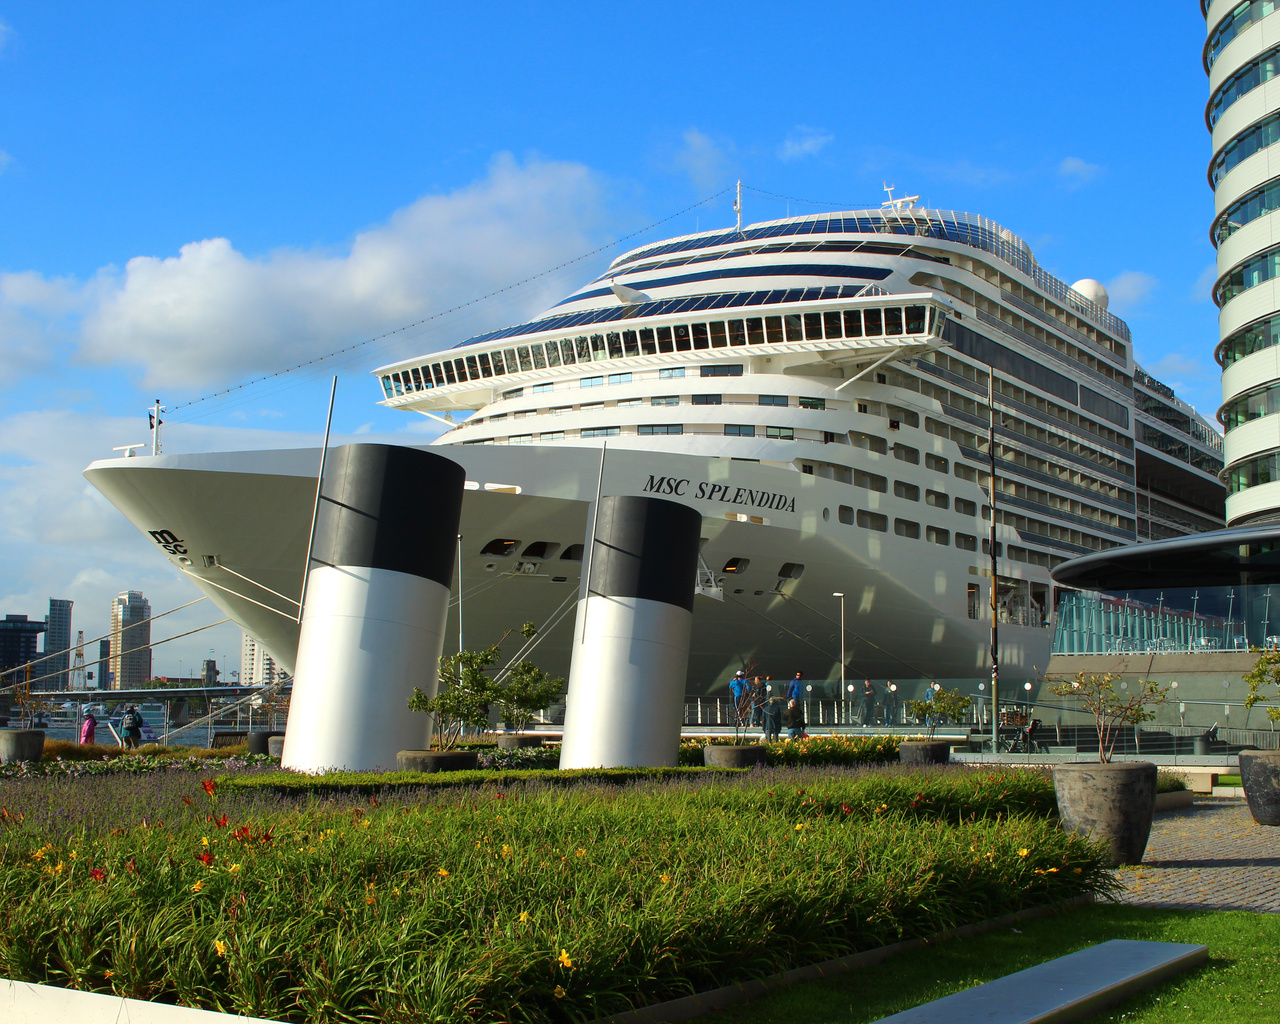 город, роттердам, корабль, здание, архитектура, вода, небо, скульптура, sky, rotterdam, holland, arhitect, лайнер, ship, liner